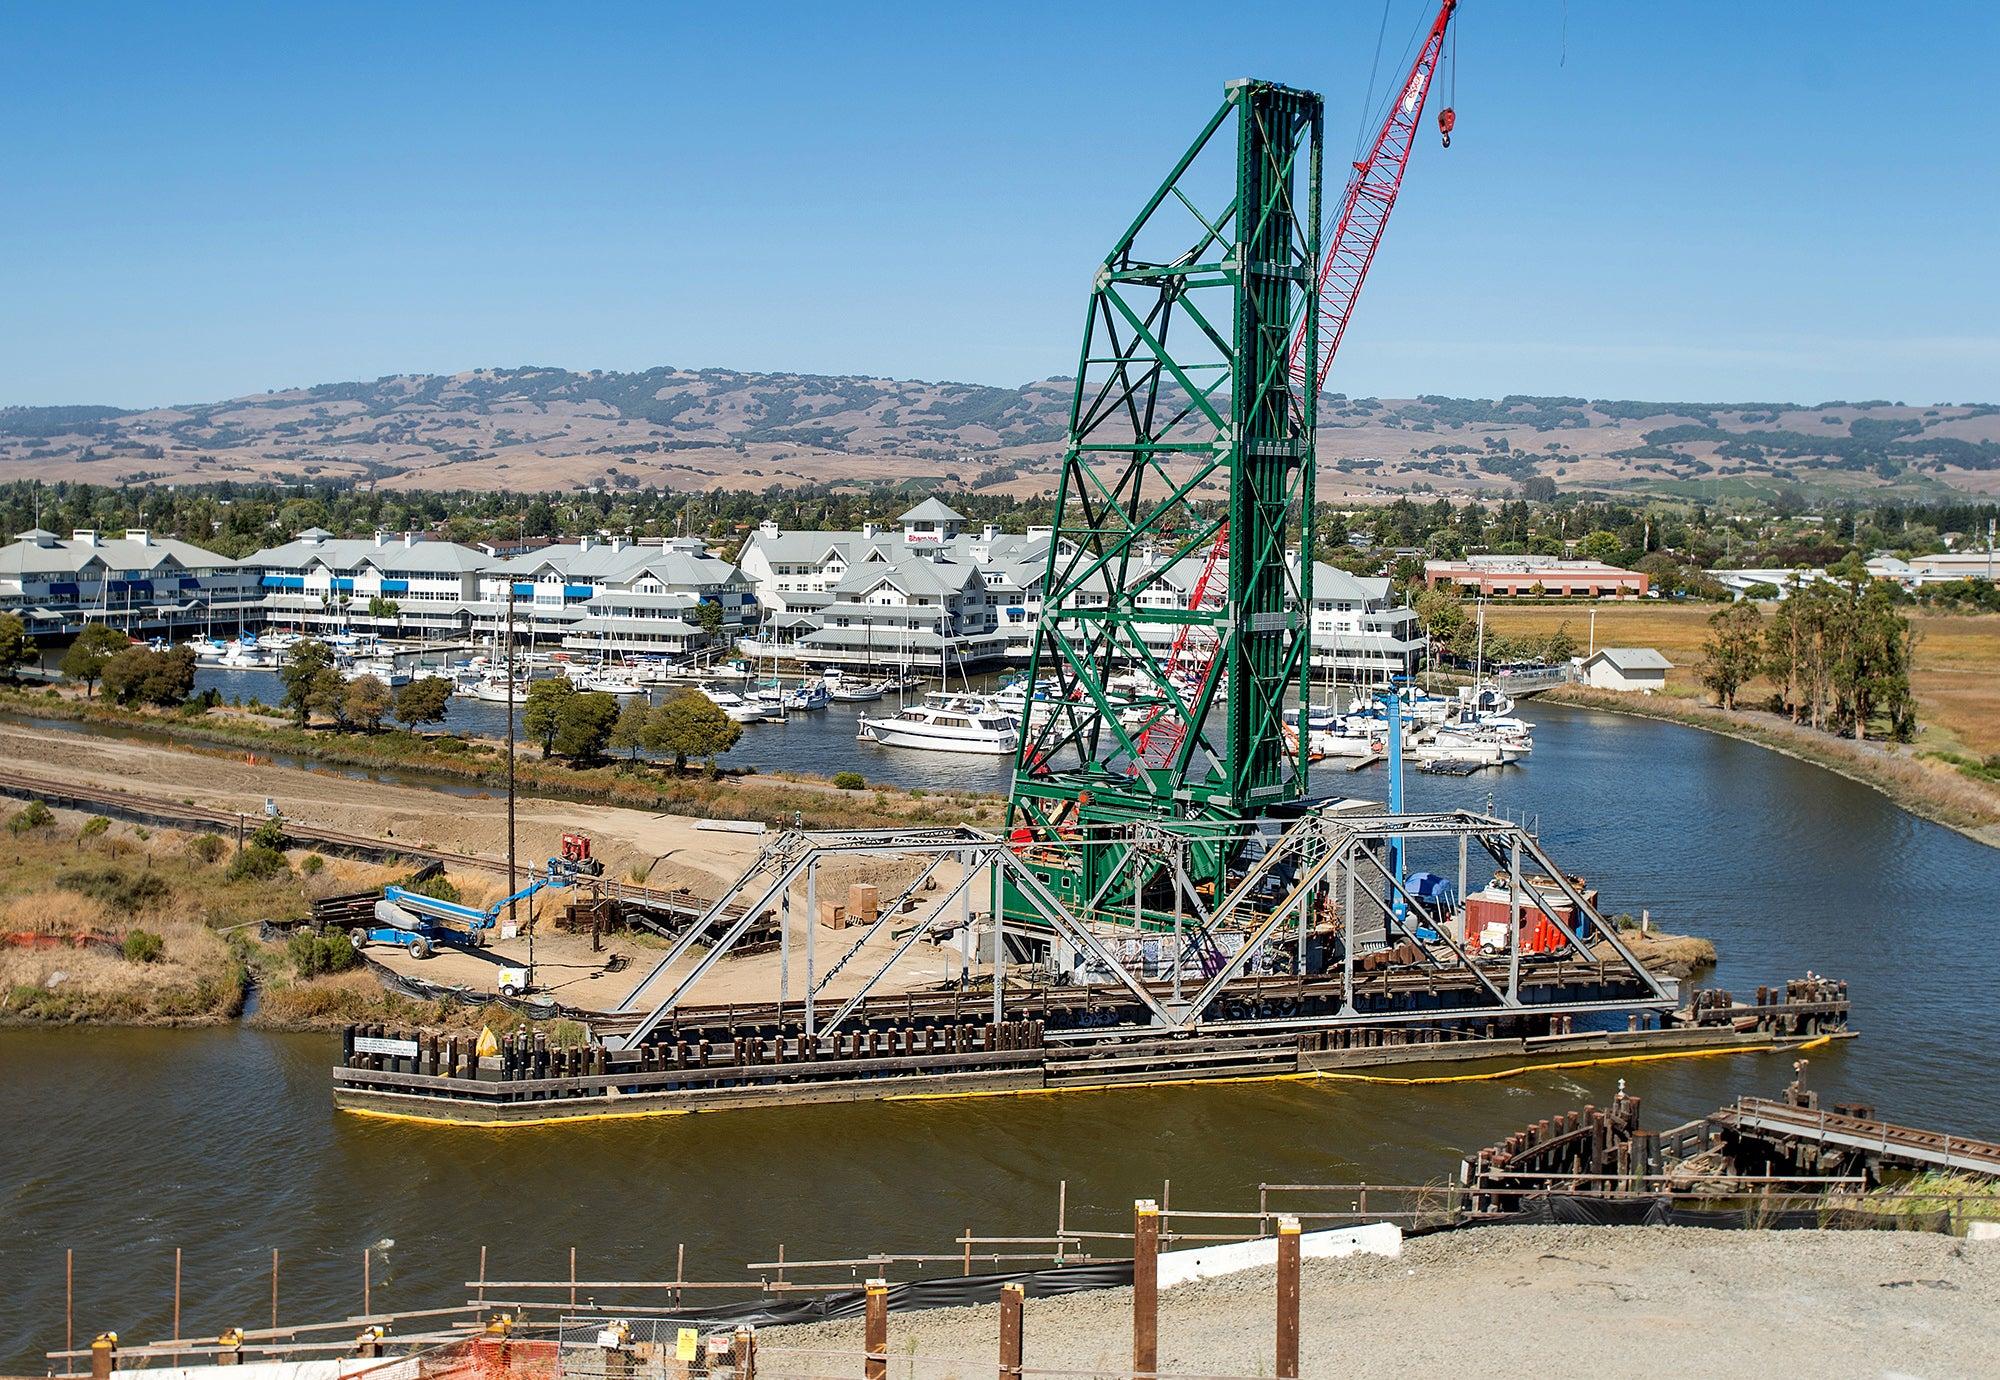 SMART Operation and Maintenance Facility in Santa Rosa